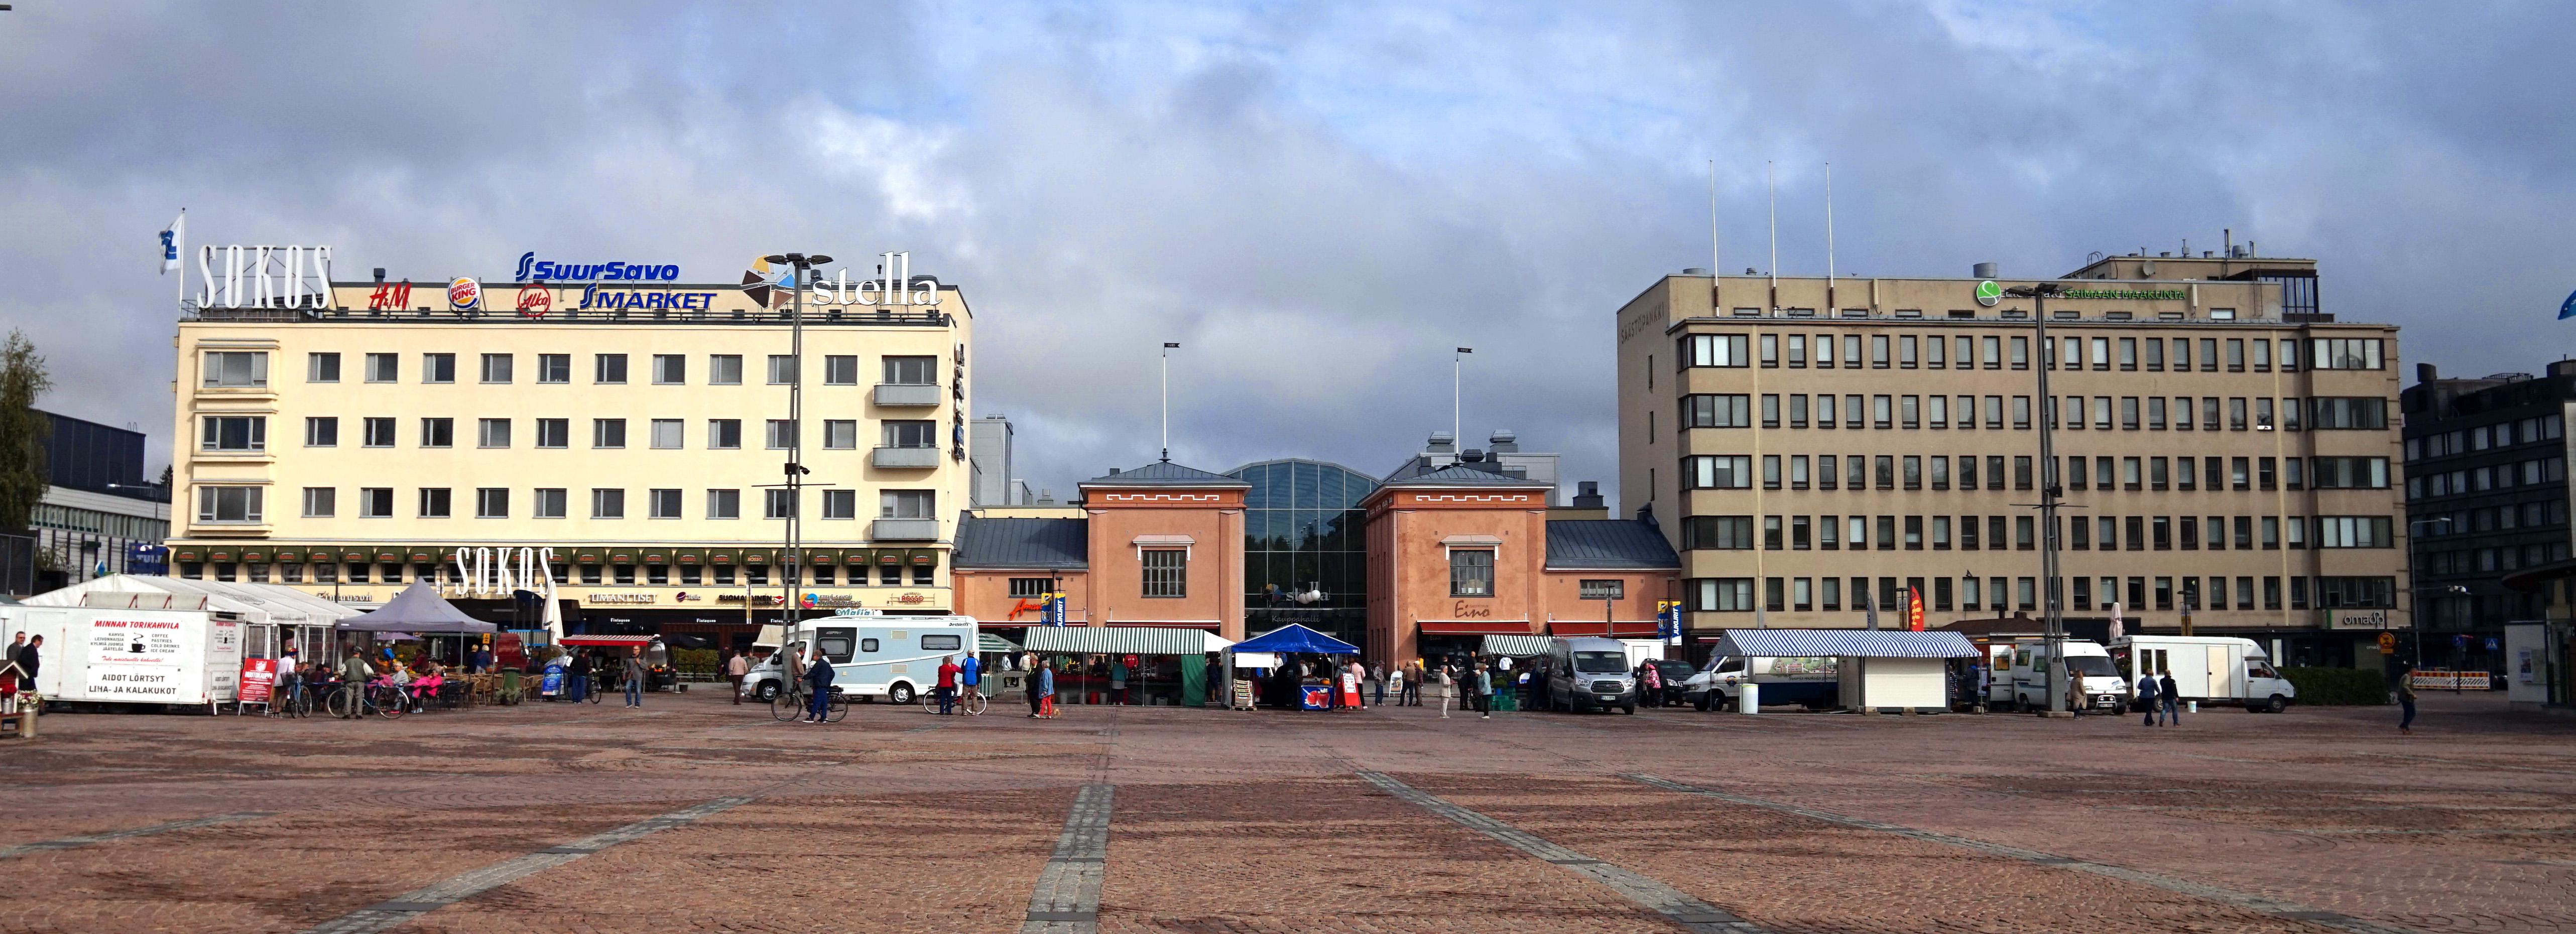 Mikkeli Market square.jpg